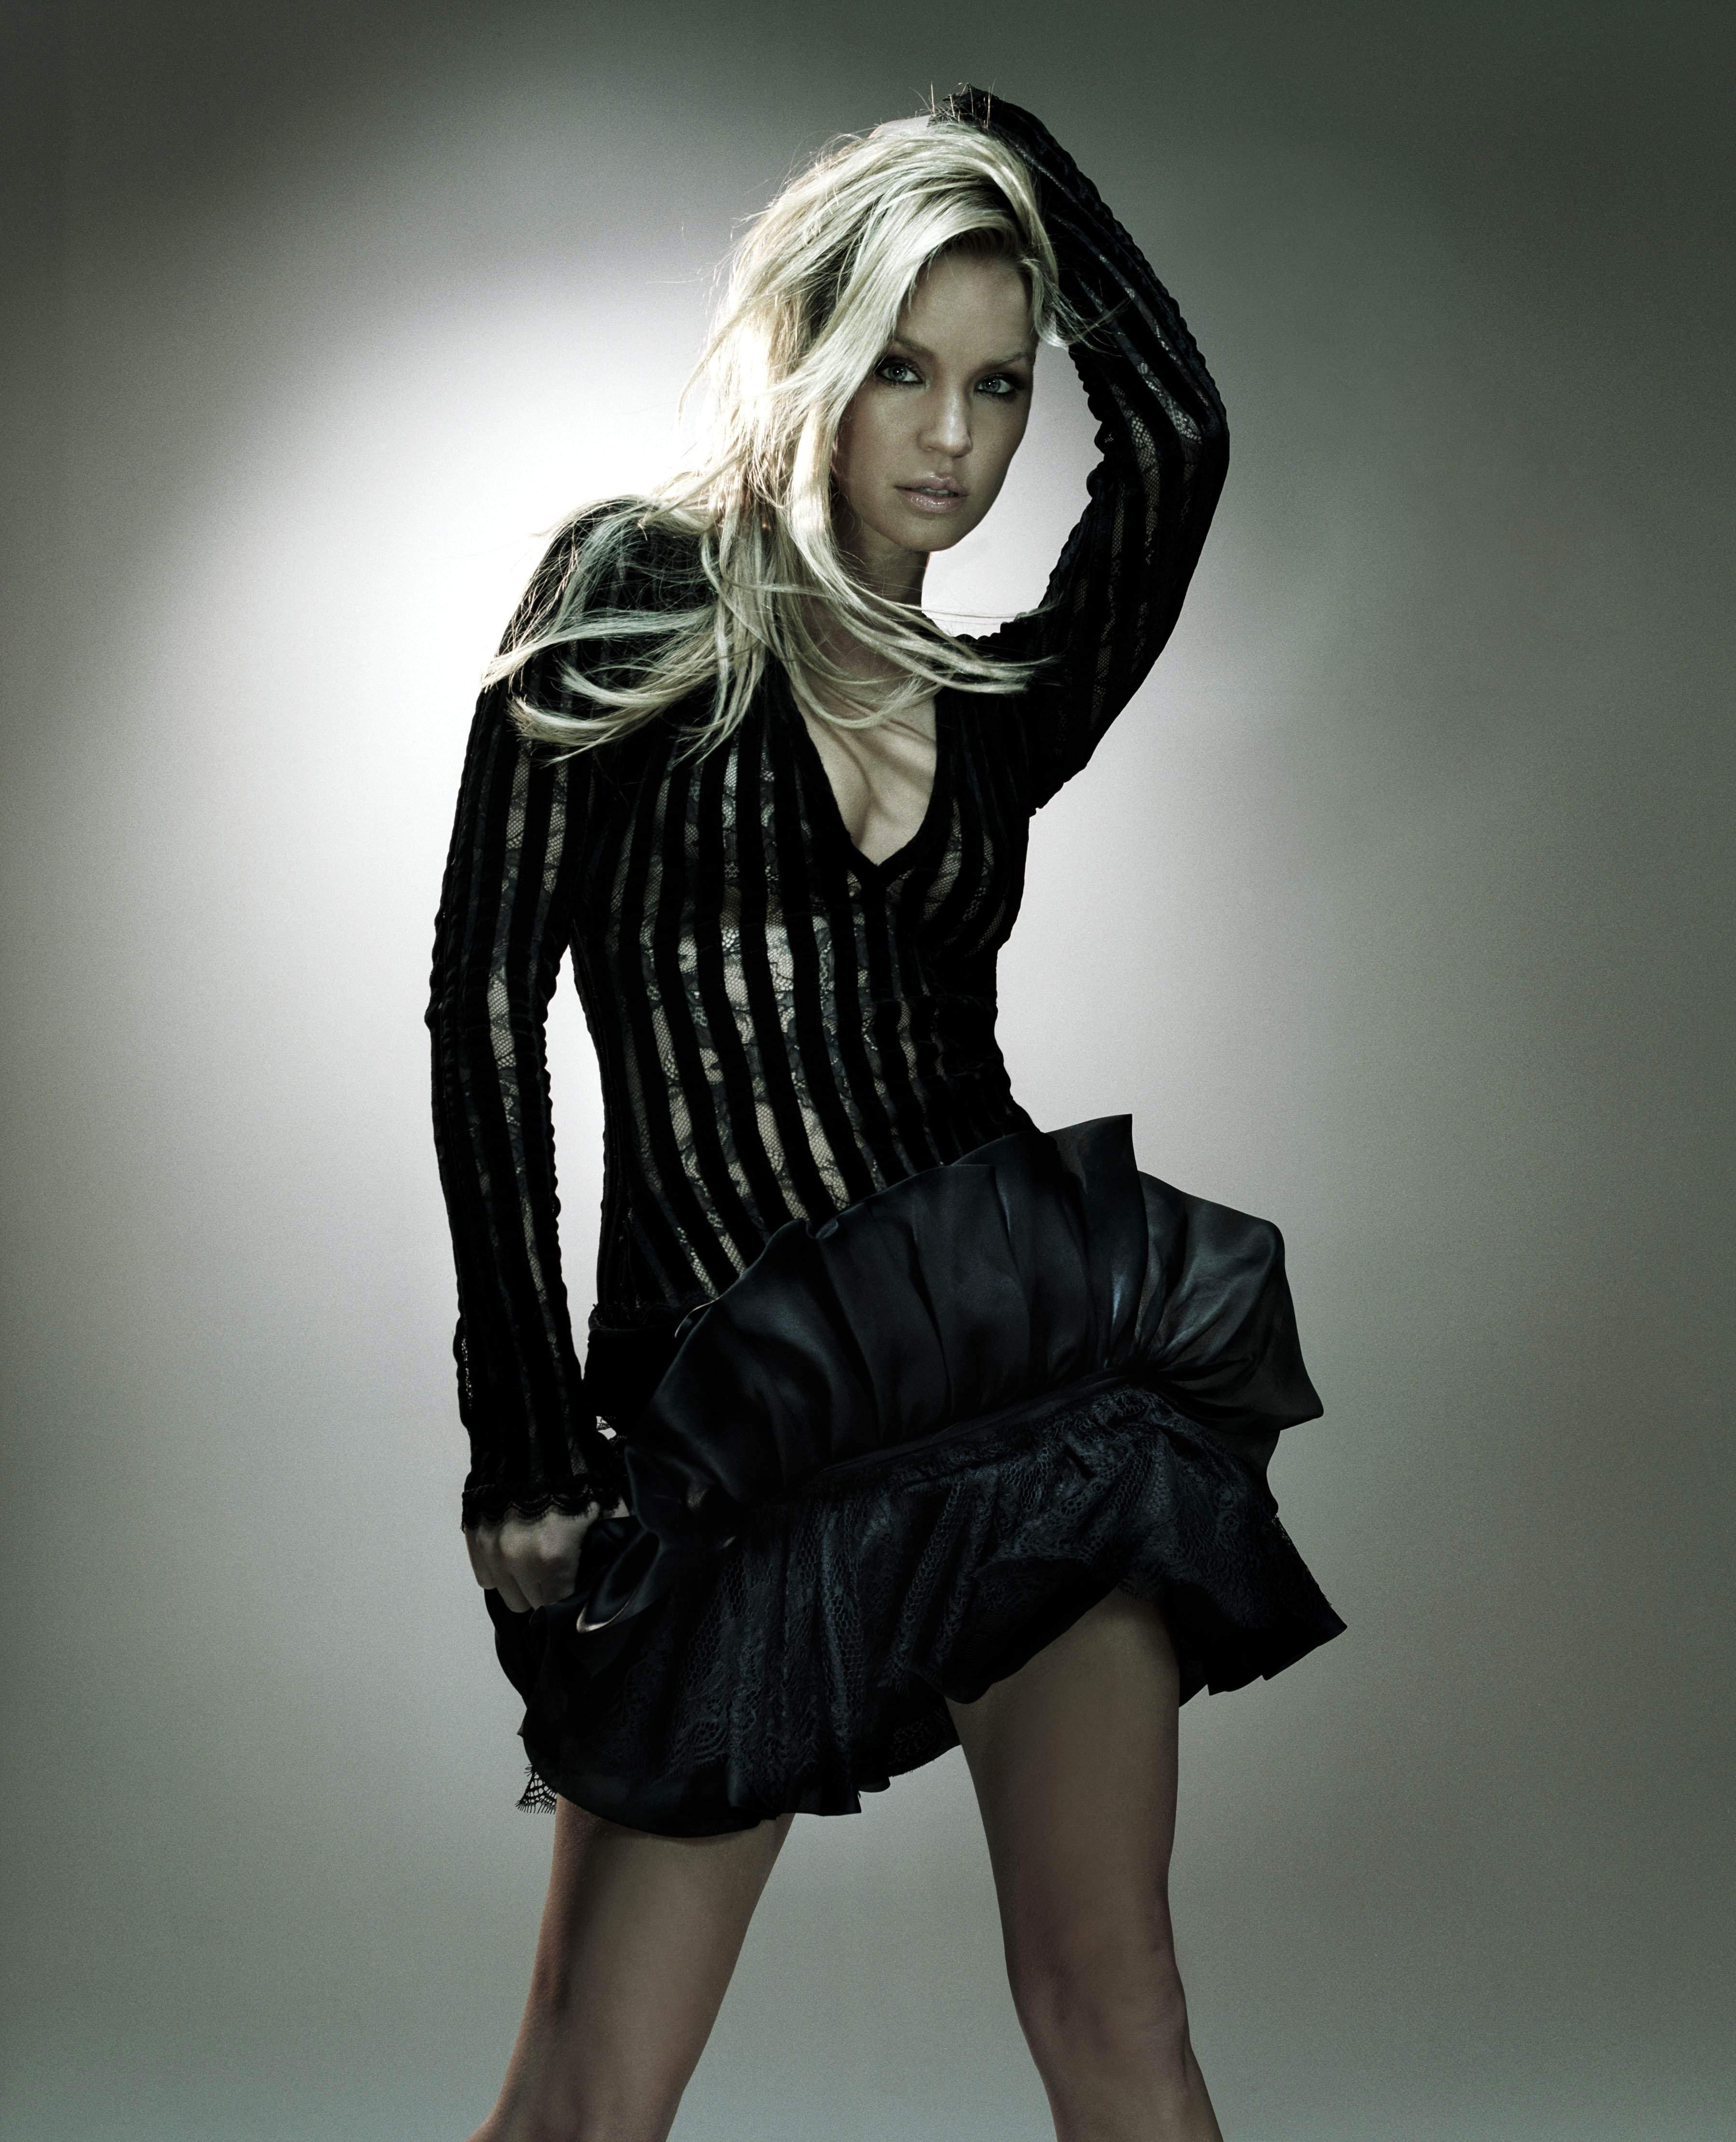 Ashley Hoelck